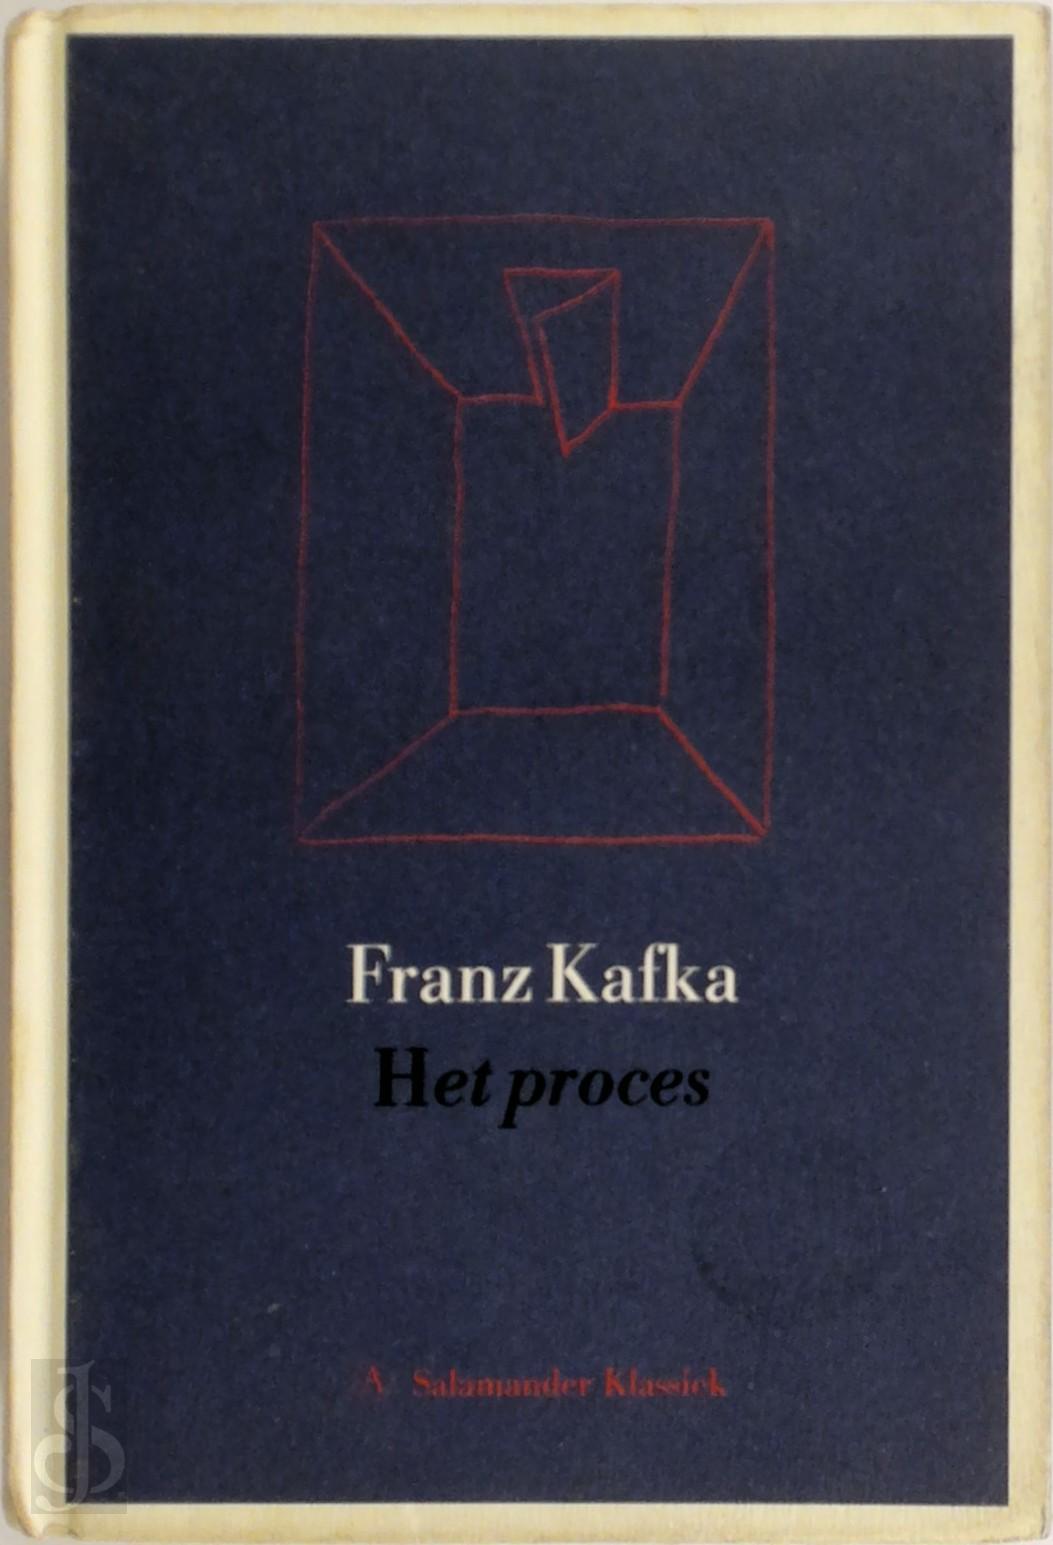 F. Kafka - Het proces